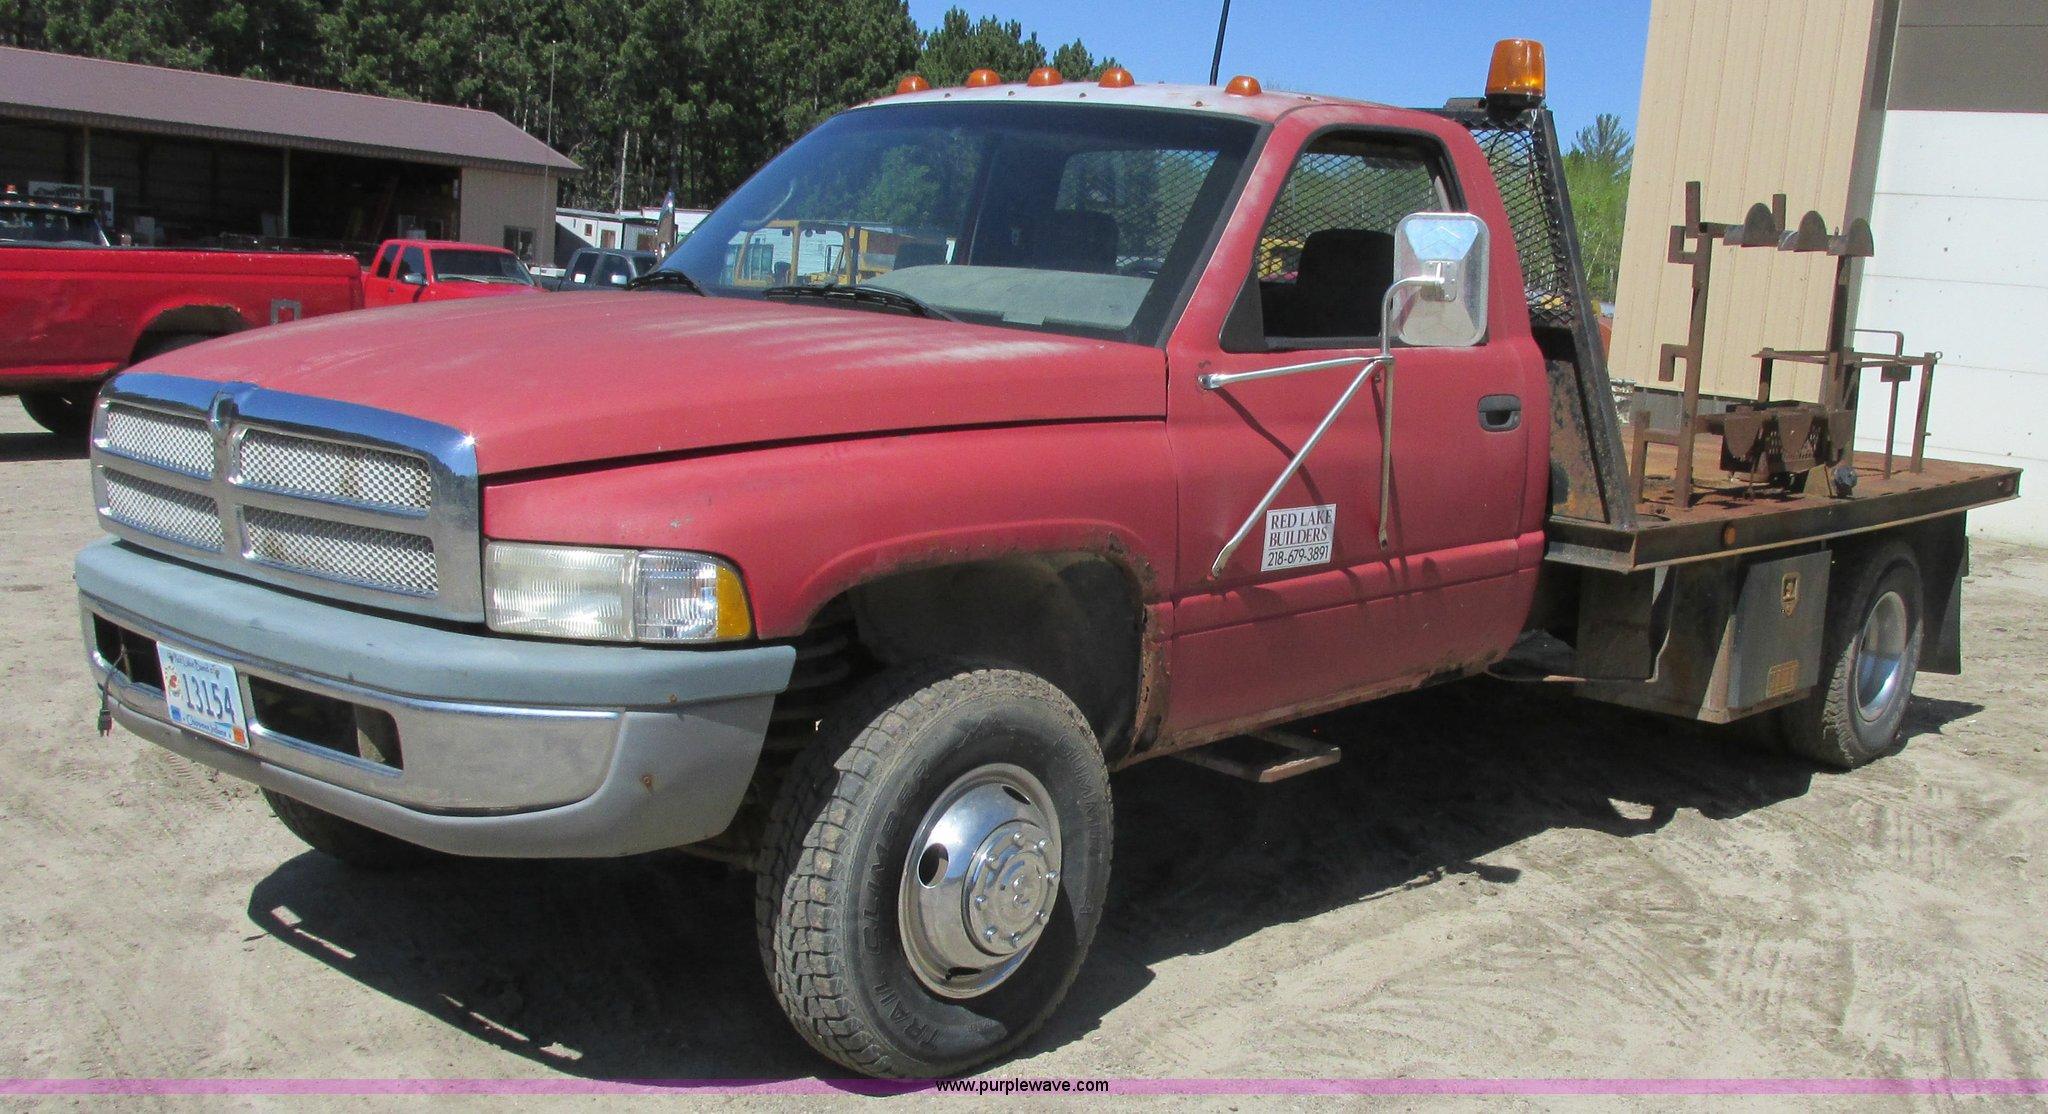 1996 dodge ram 3500 flatbed pickup truck in red lake mn item a8819 sold purple wave 1996 dodge ram 3500 flatbed pickup